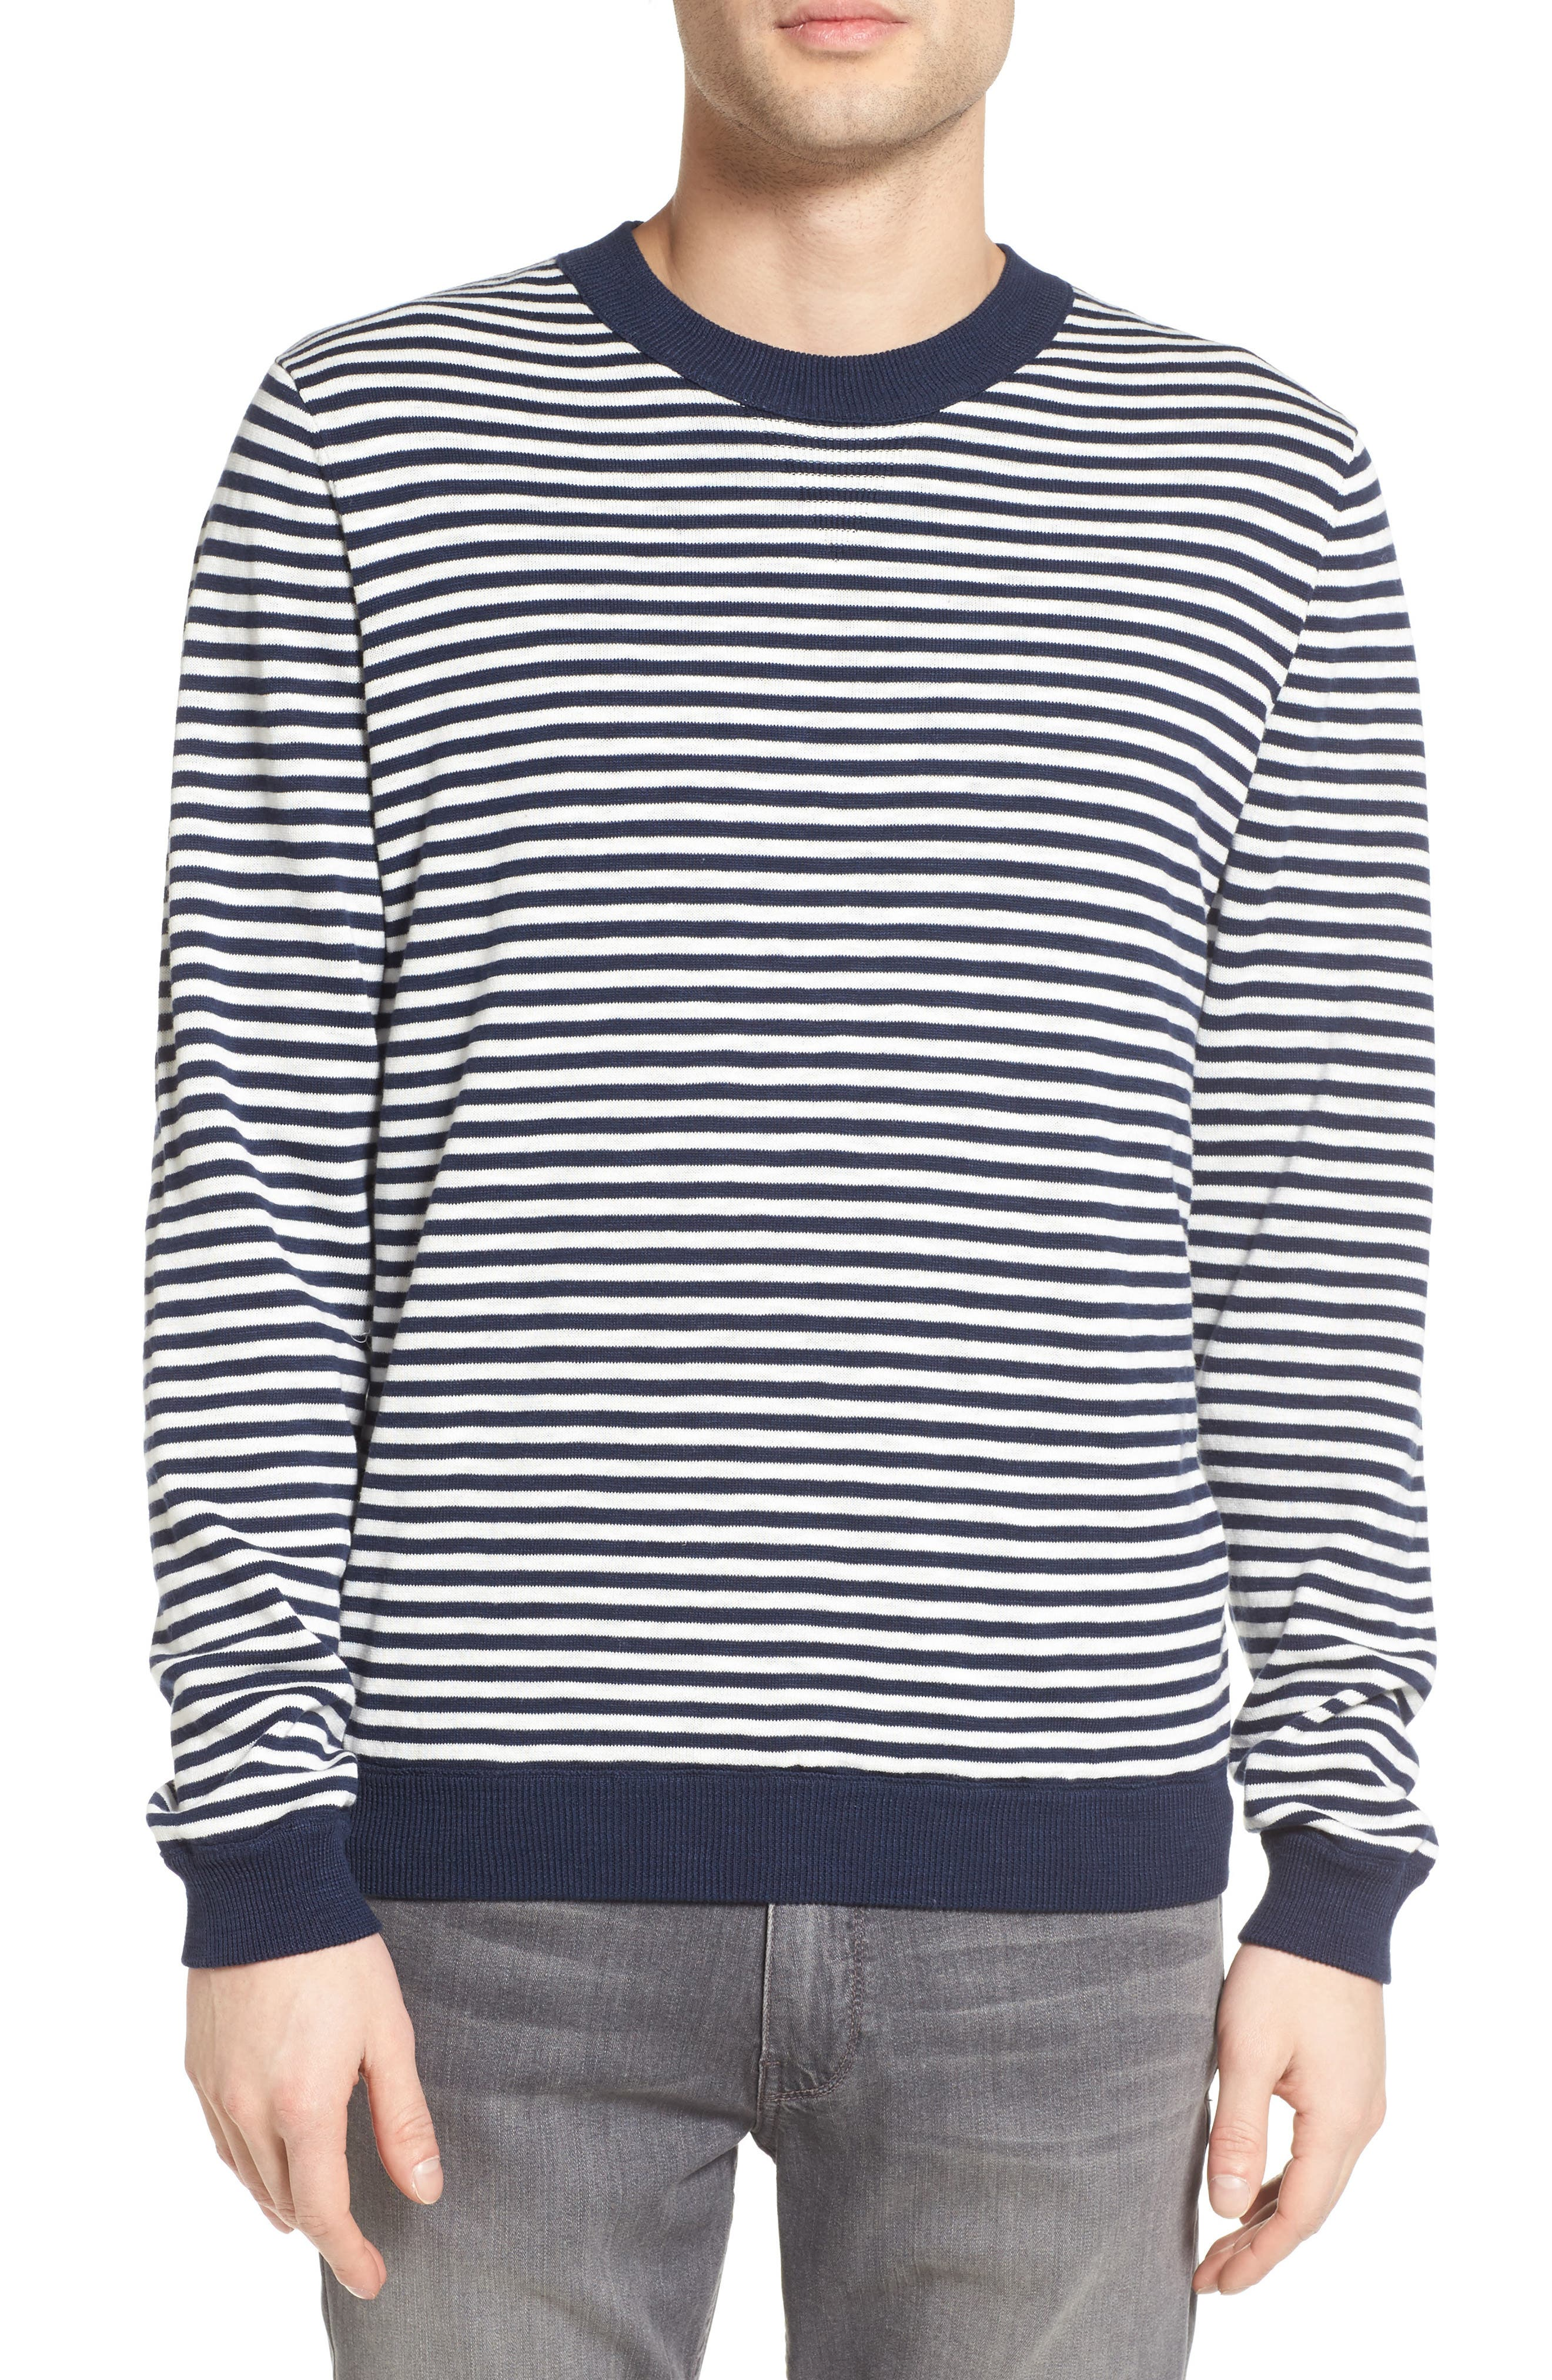 Luca Reversible Cotton & Linen Pullover,                             Alternate thumbnail 4, color,                             Turbid Stripe Night Sea/ White